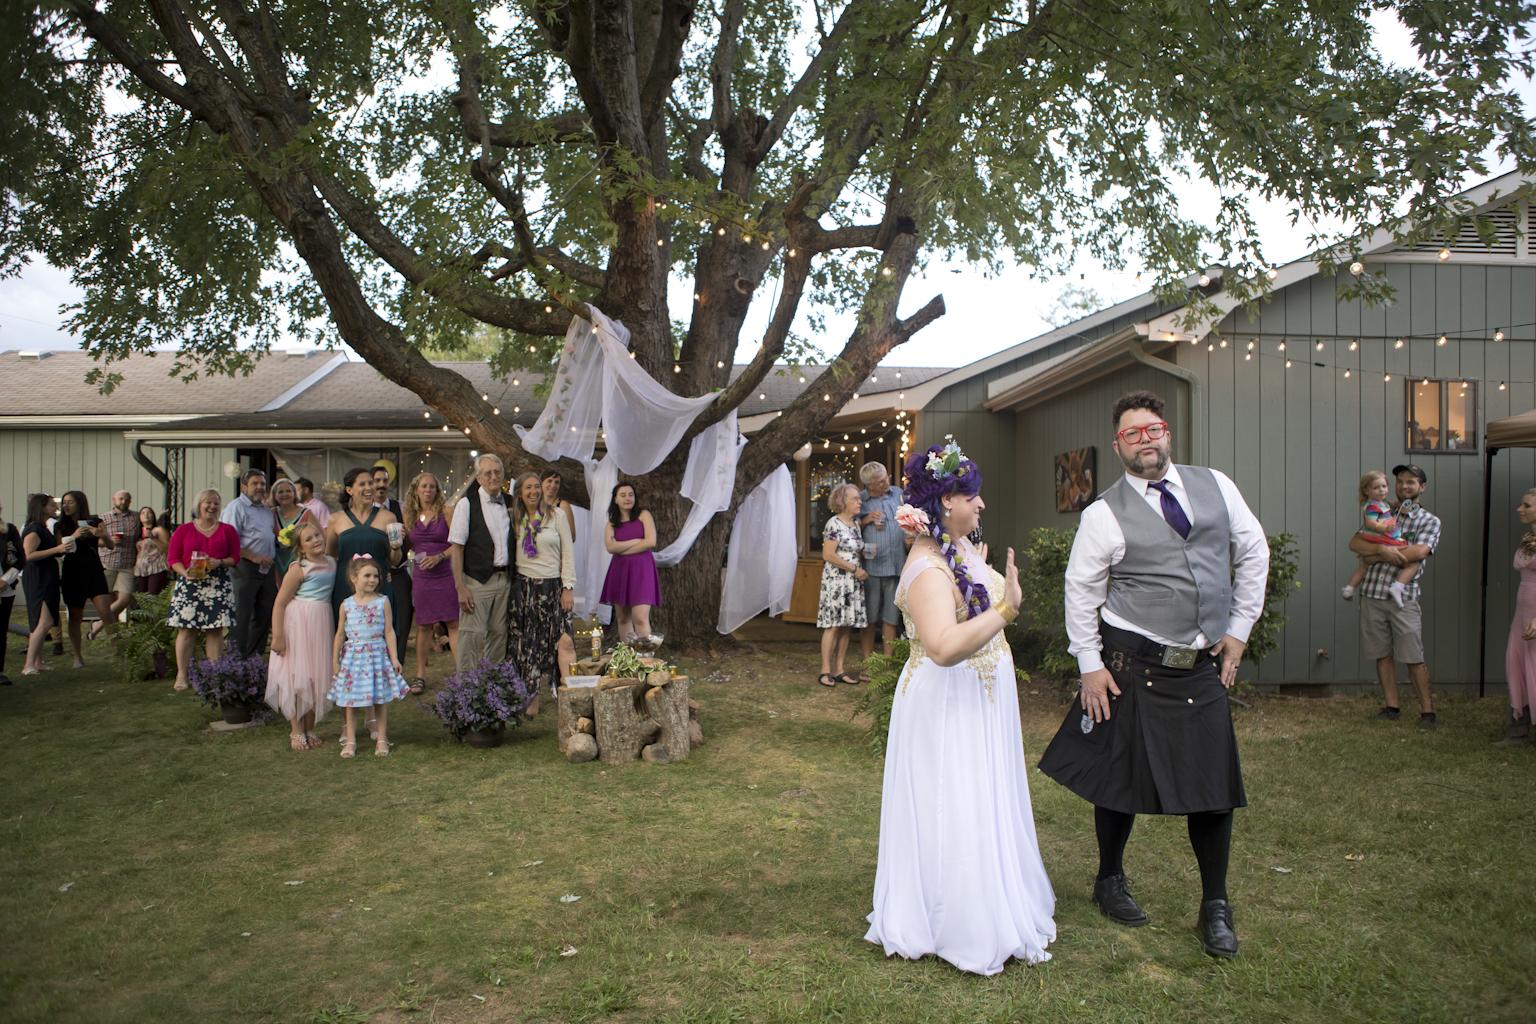 Tina and Adam wedding_Studio Misha Wedding Photography Asheville Photographer and Videographer00114.JPG